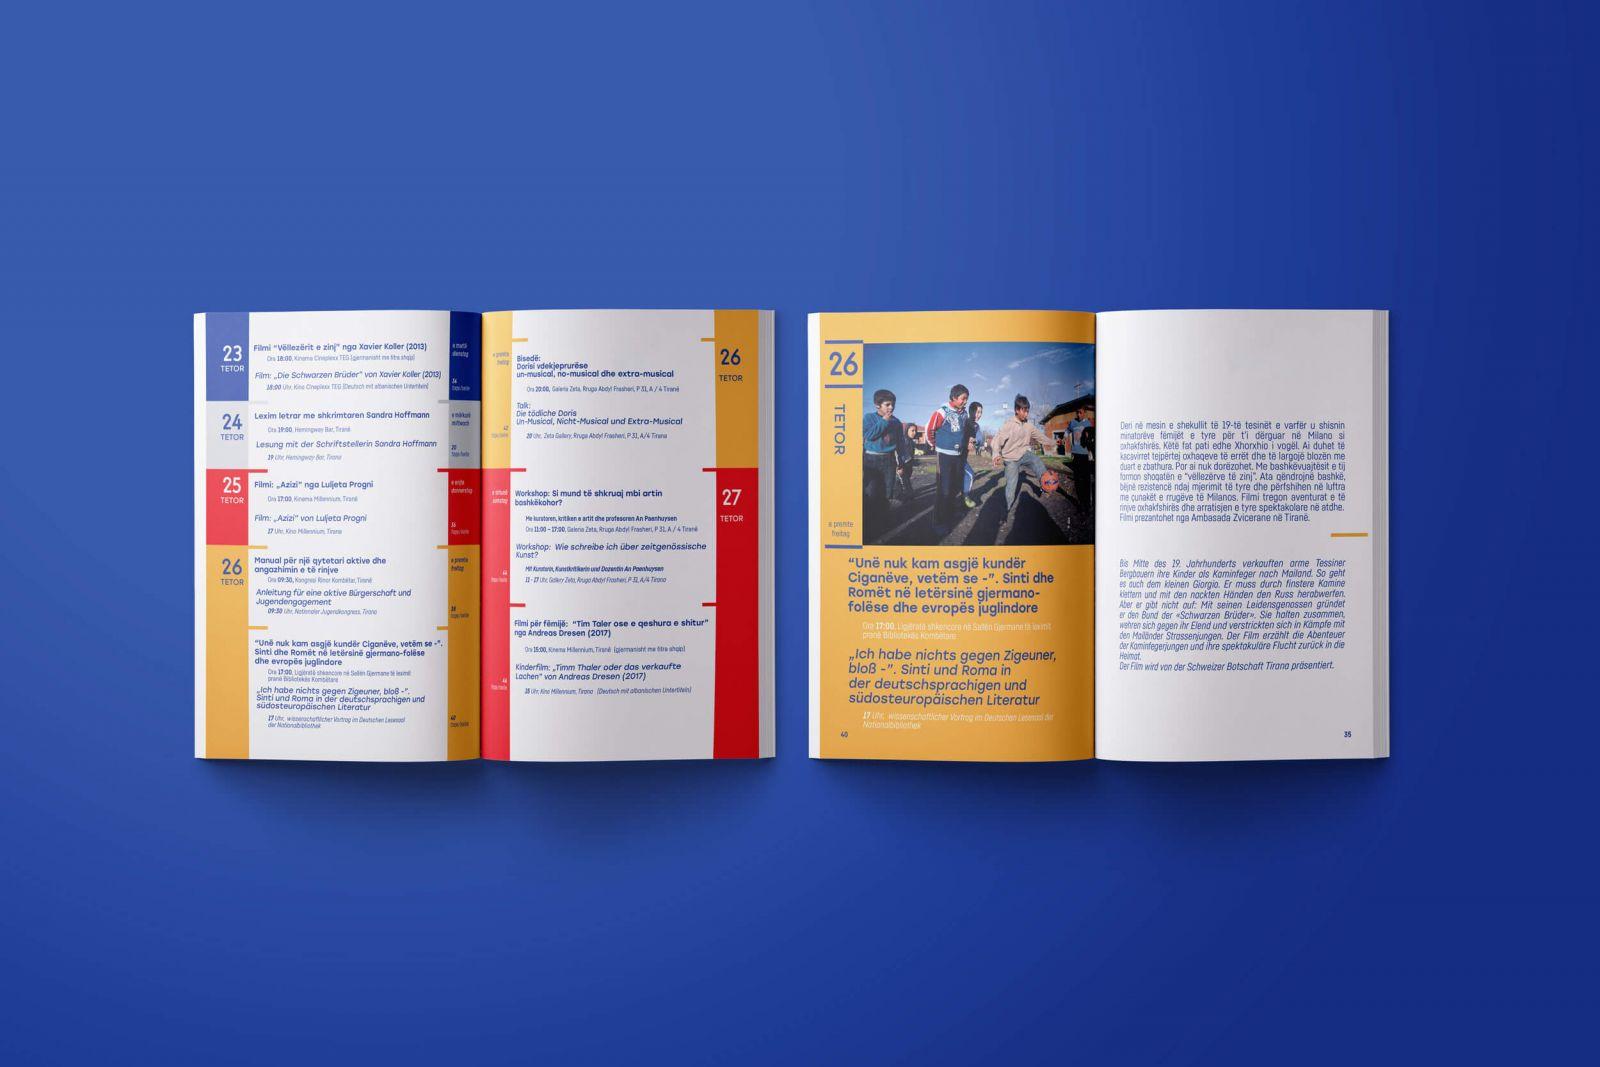 German October 2018 booklet opened